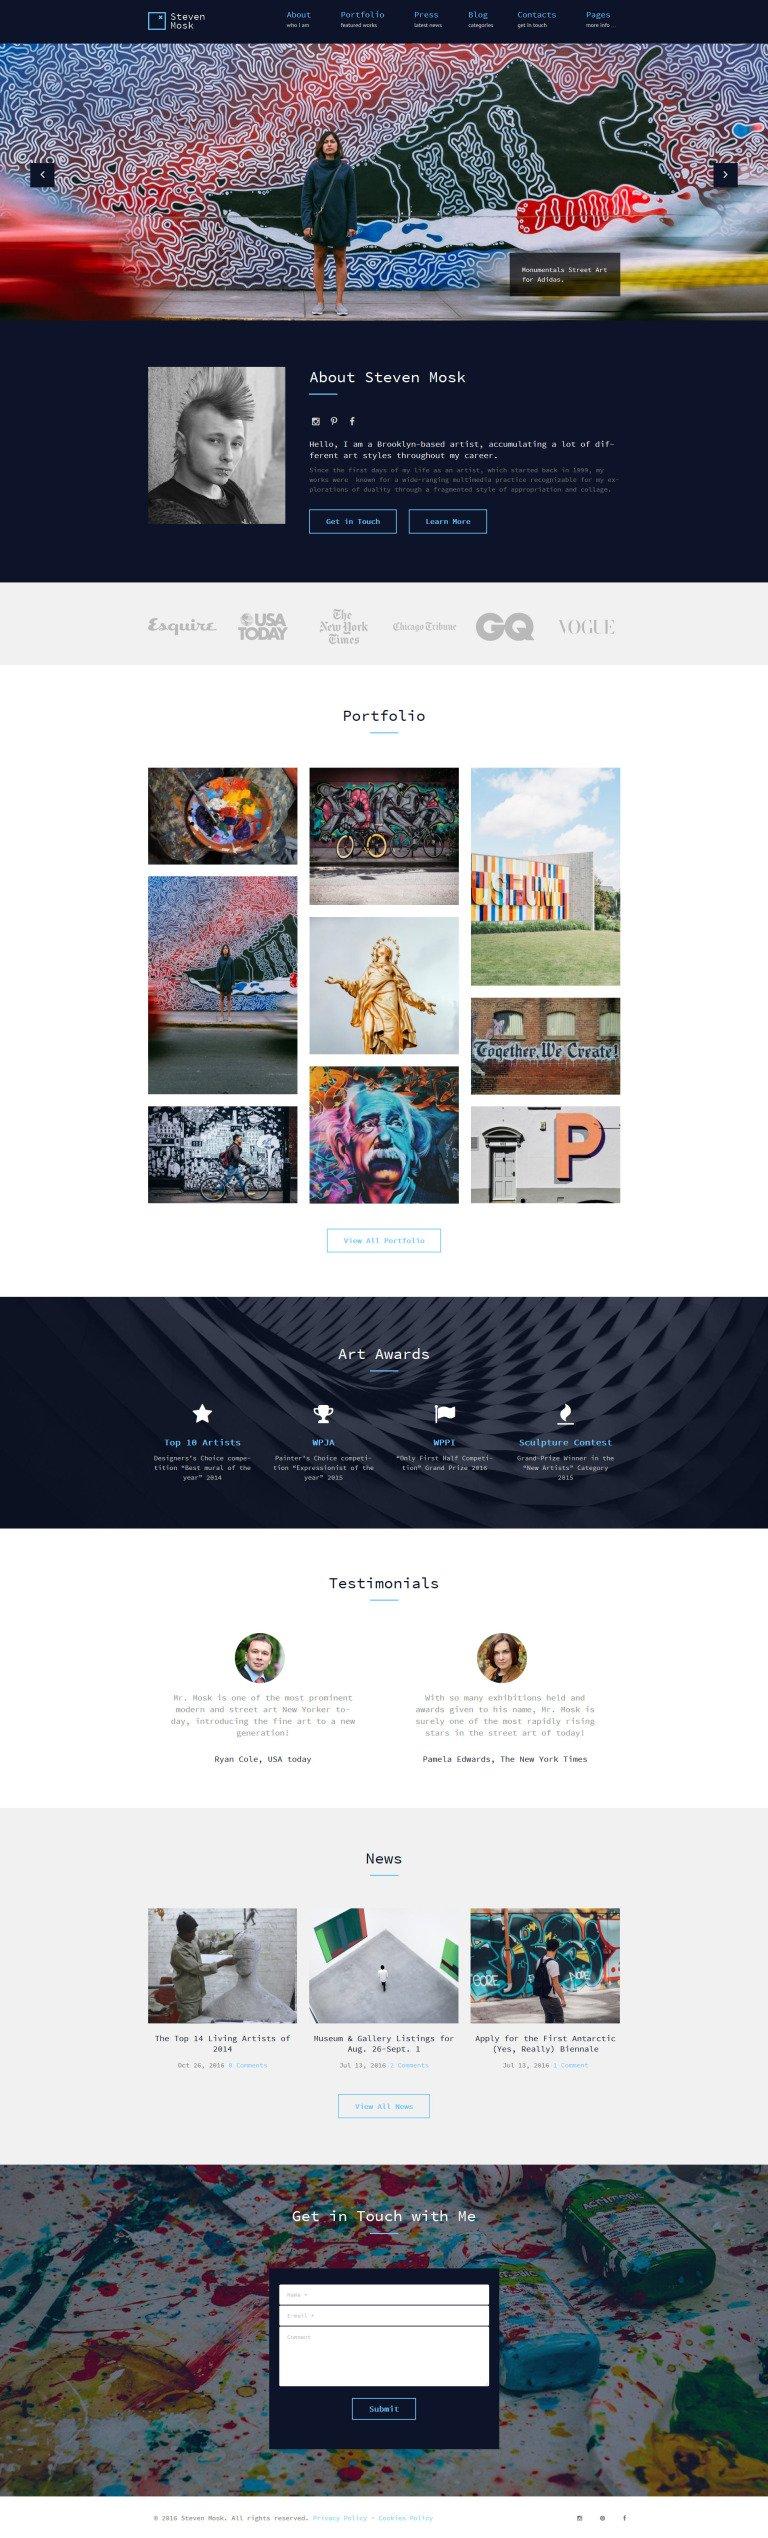 Steven Mosk - Modern artist personal portfolio WordPress Theme New Screenshots BIG